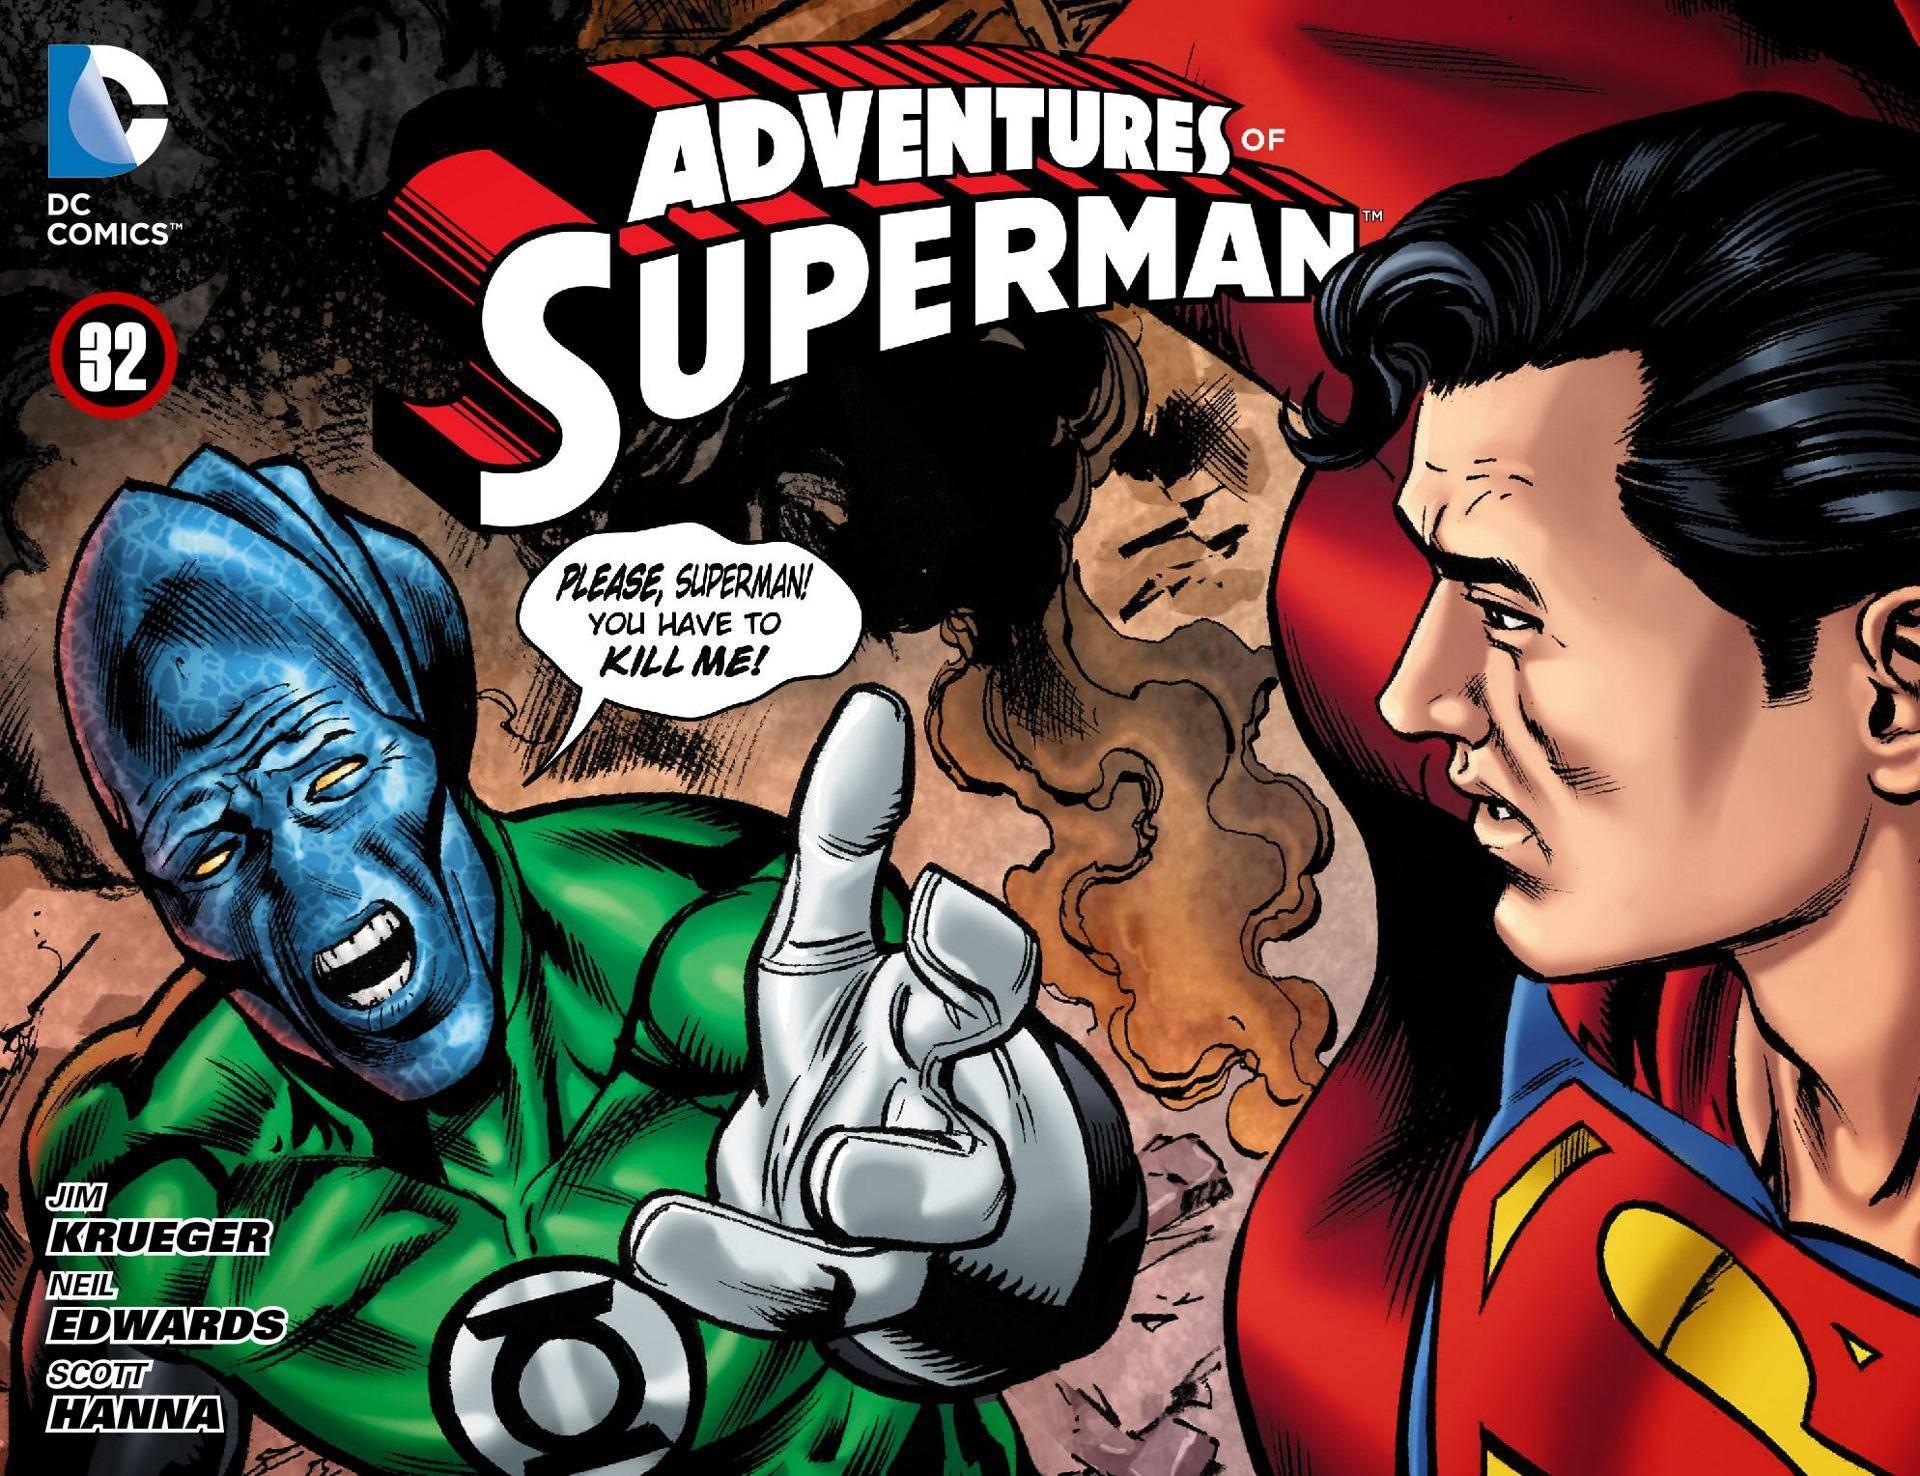 Adventures of Superman 032 2013 Digital